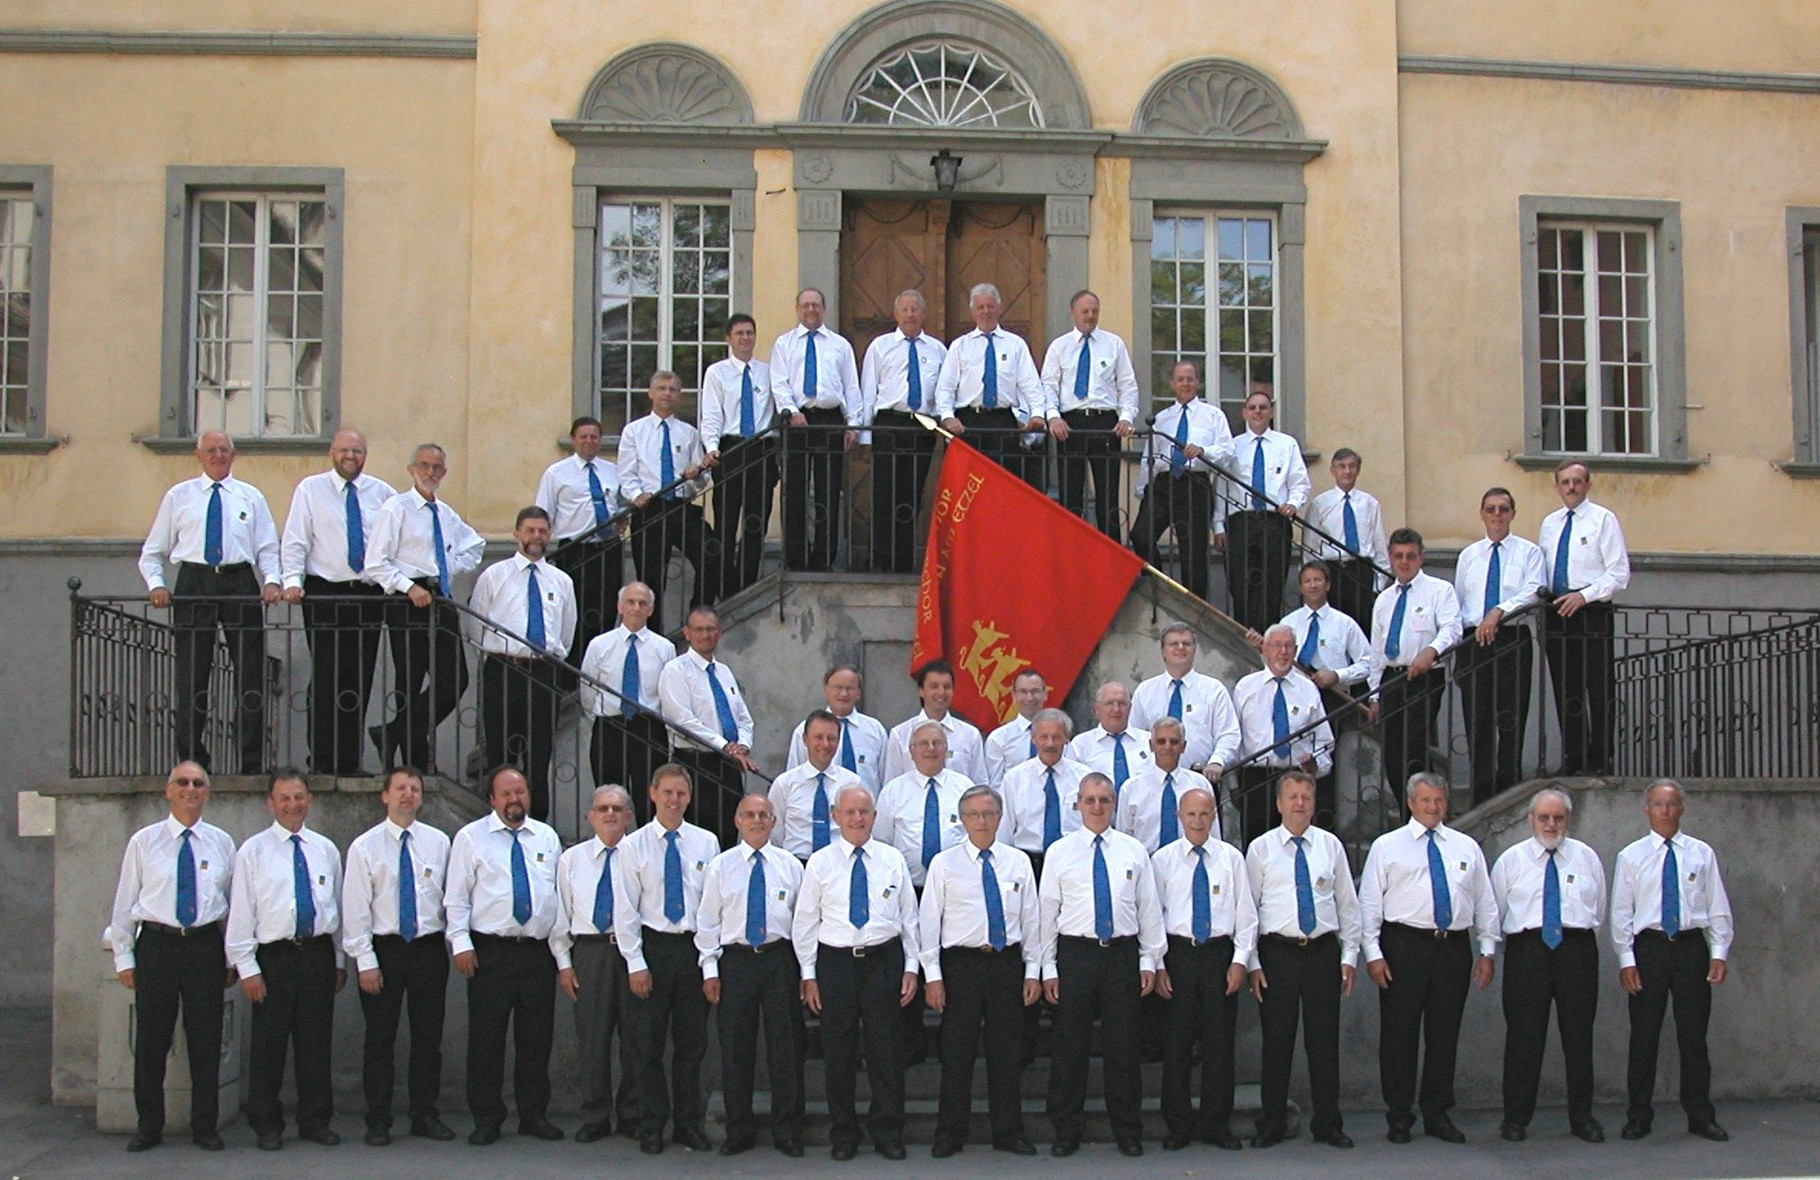 Gesangfest in Chur 2006